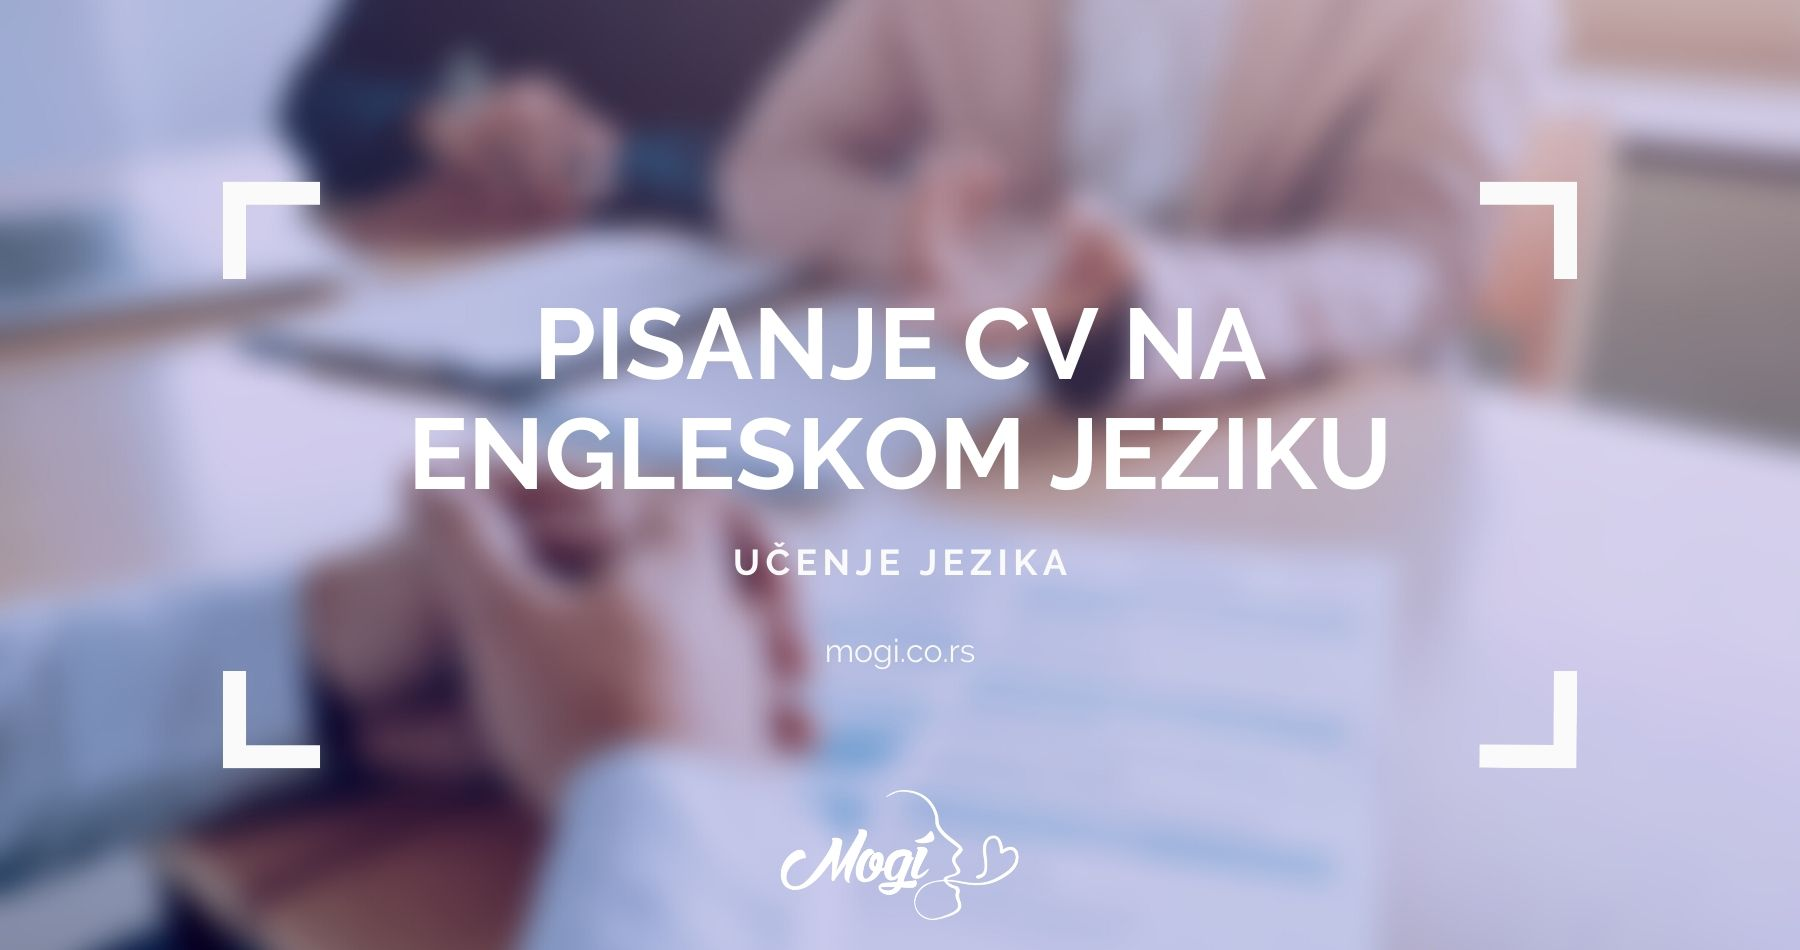 CV na engleskom jeziku